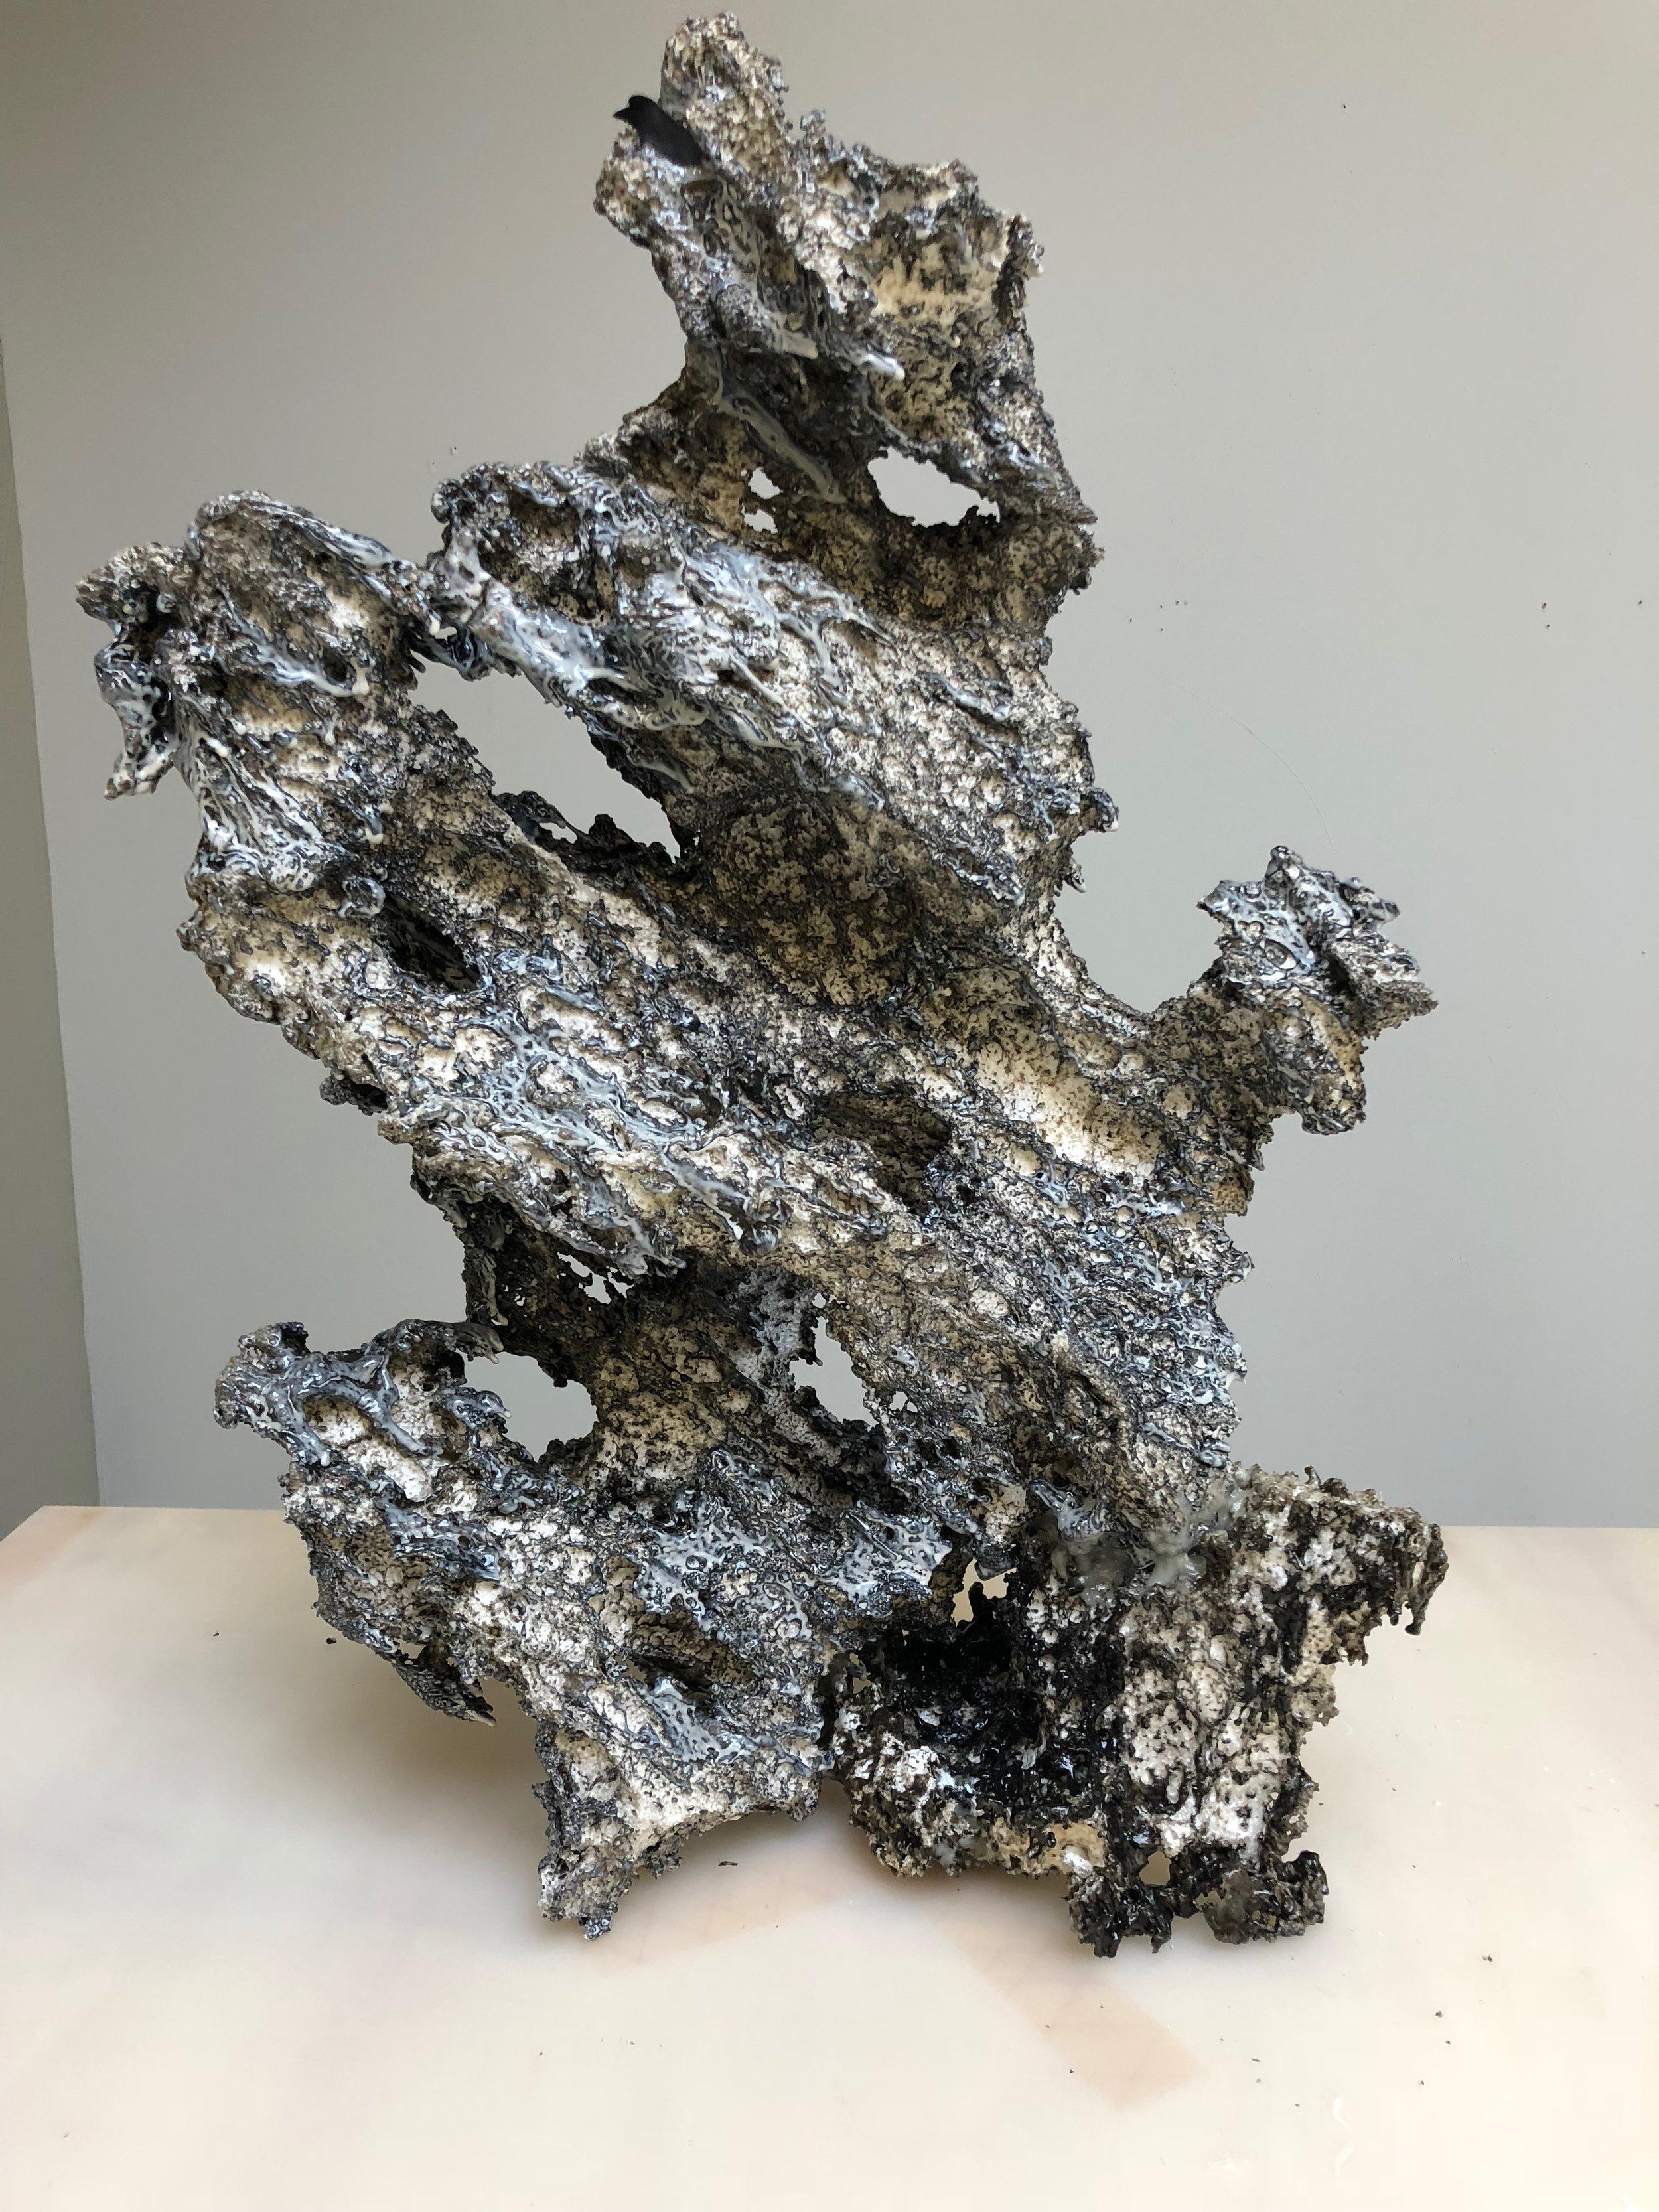 R Fishman  %22for RR%22 2018  28 1:2%22 X 20%22 x 12%22  polystyrene, epoxy.jpg